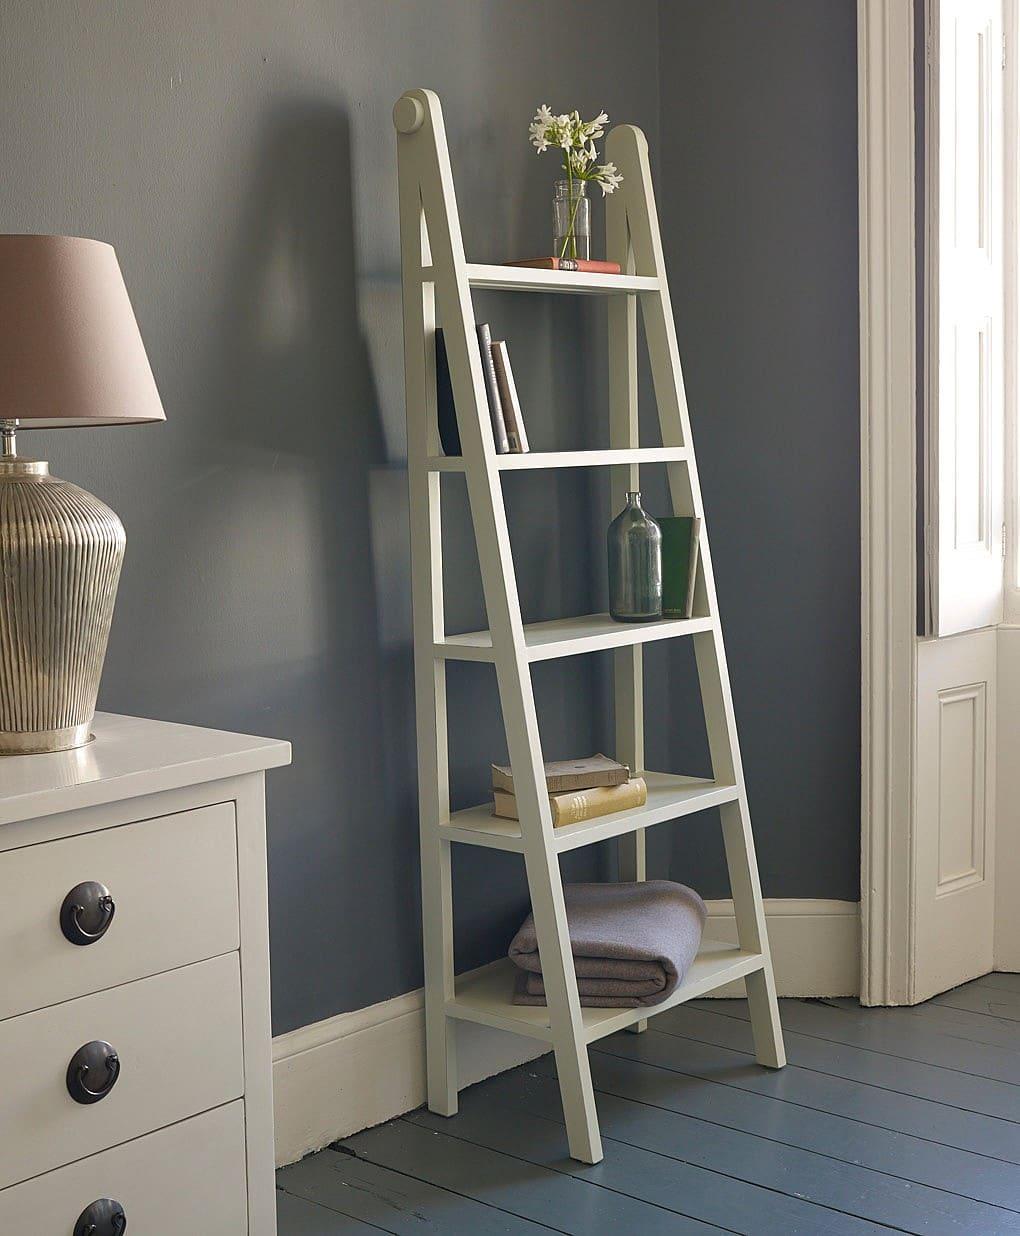 Use a ladder as a shelf.